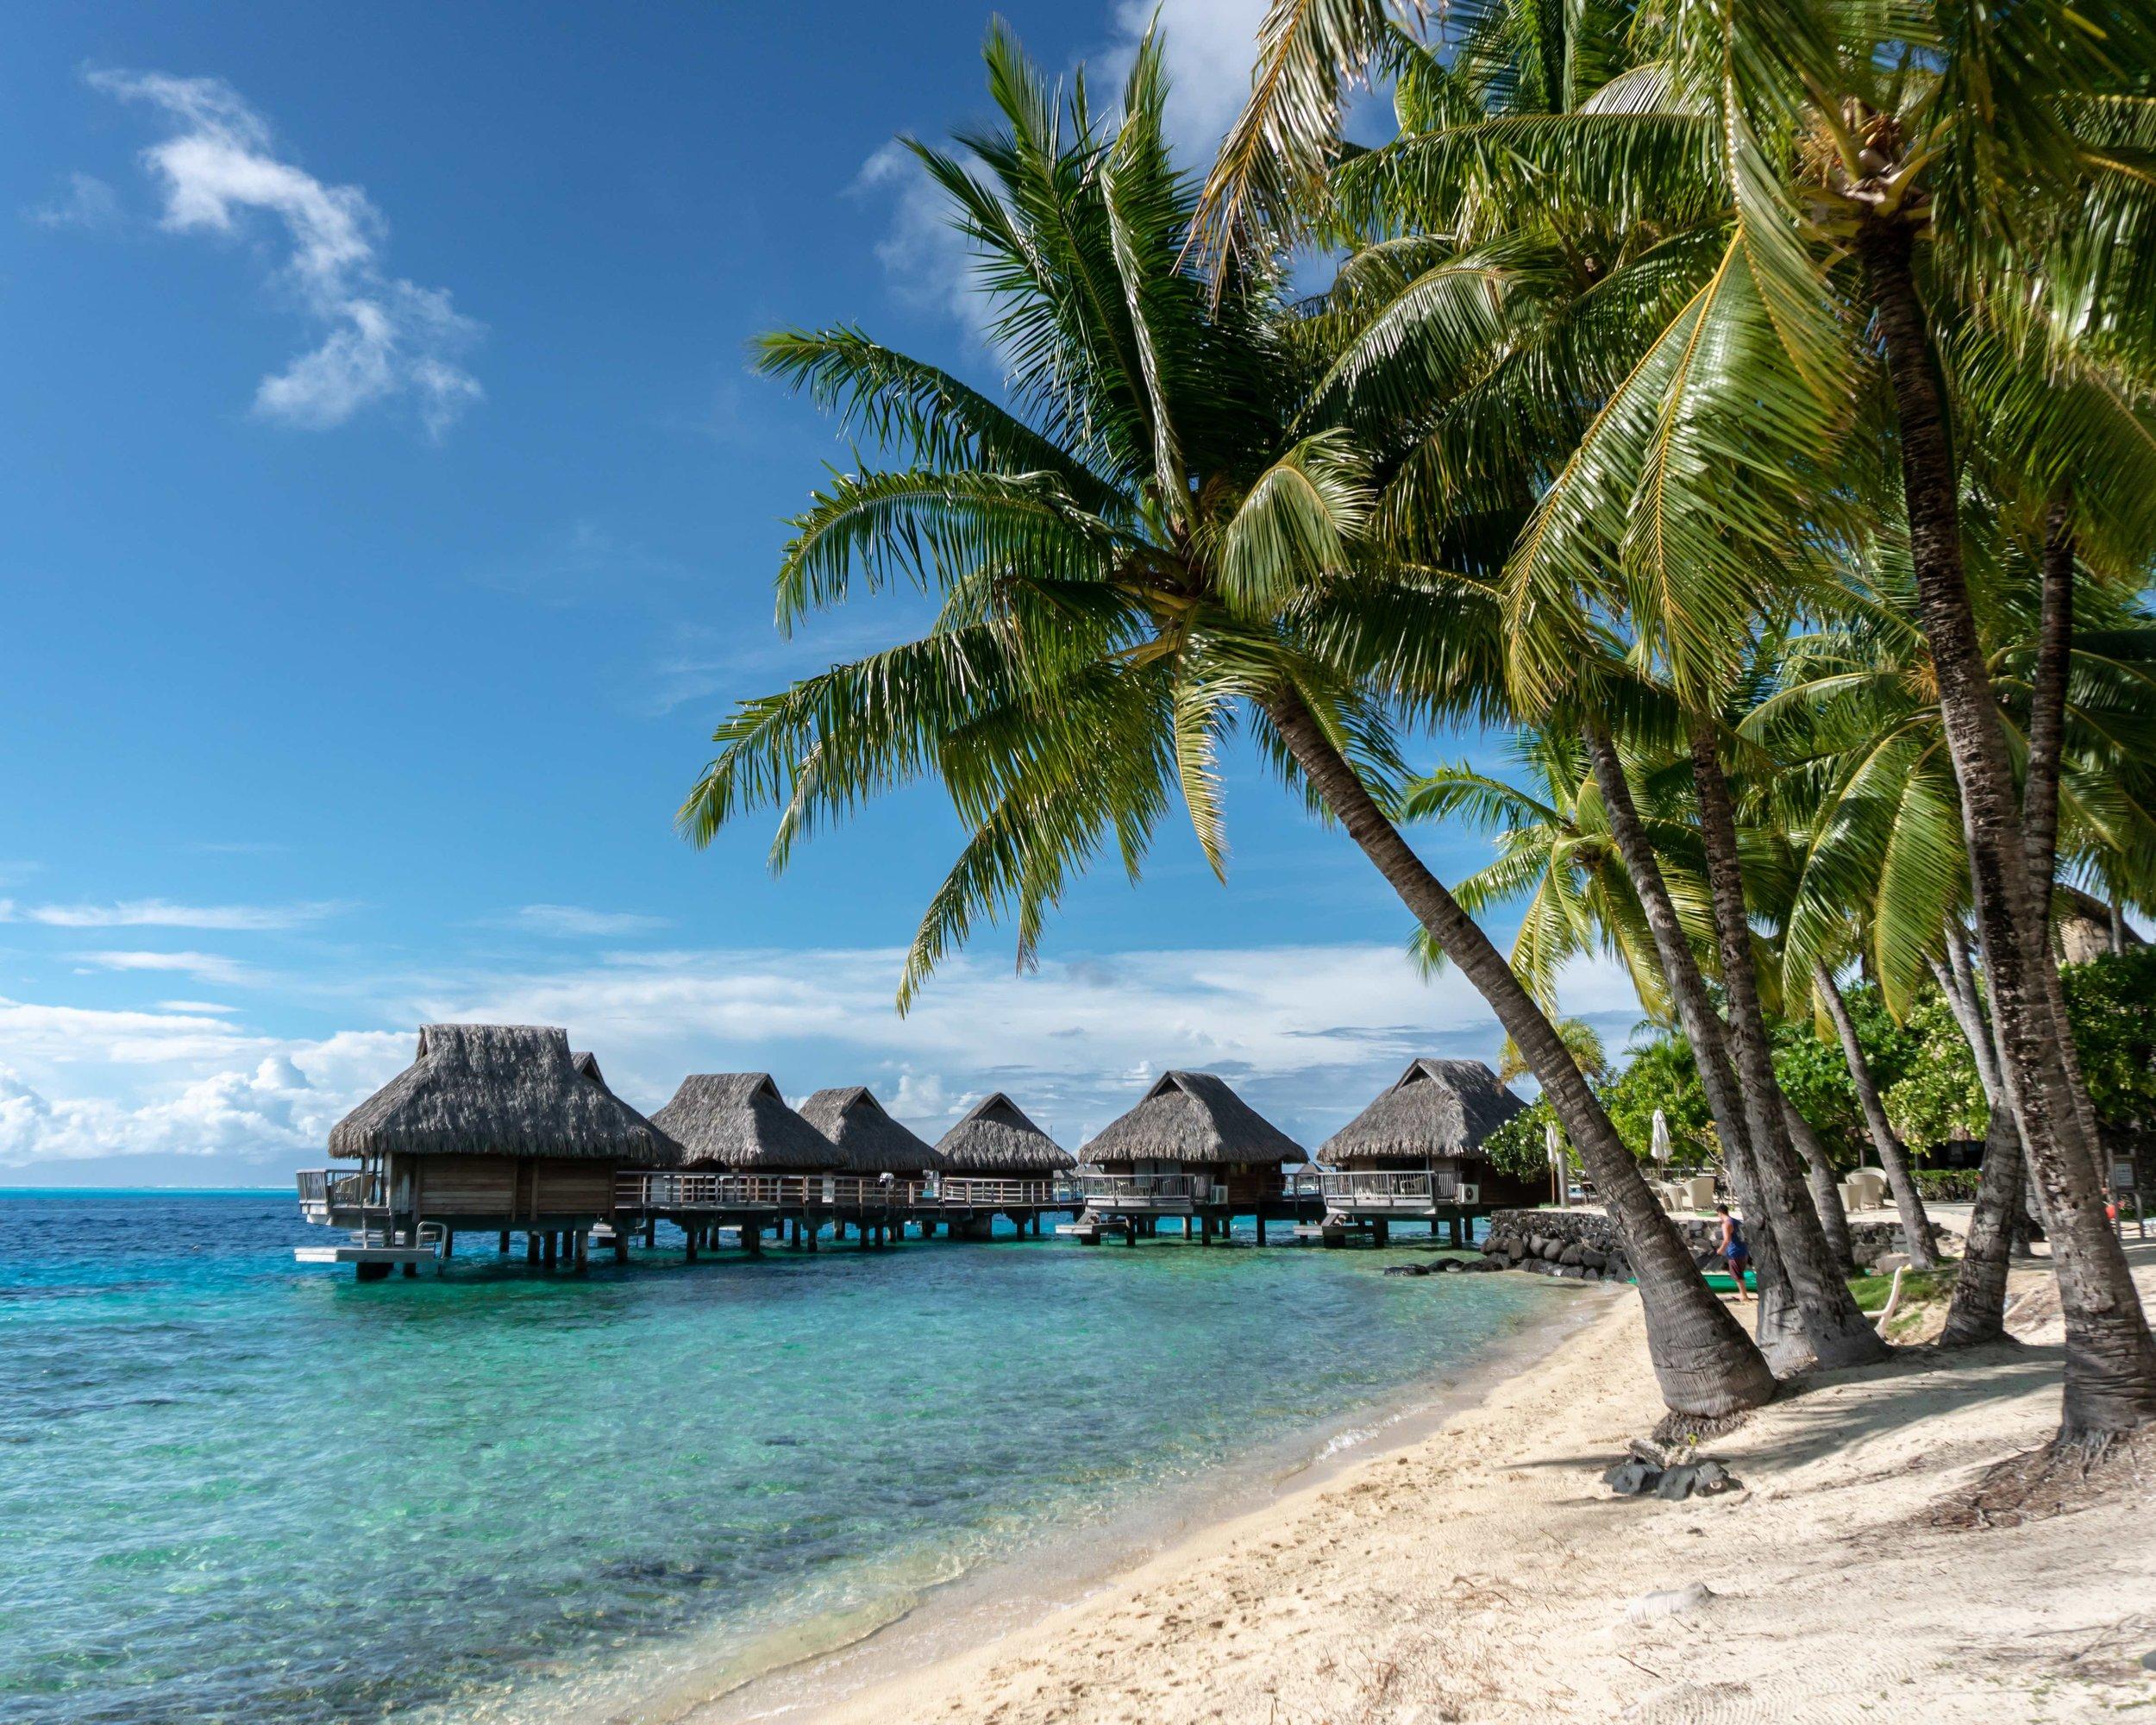 tropical_paradise_beach_island_bora bora_bungalow_south pacific_2.jpg